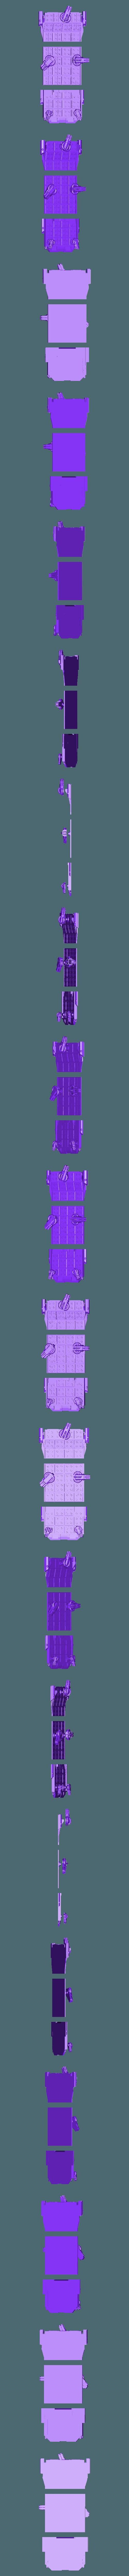 Minimal_StarShip_Example.stl Download free STL file Minimal Star Ship • Design to 3D print, mrhers2